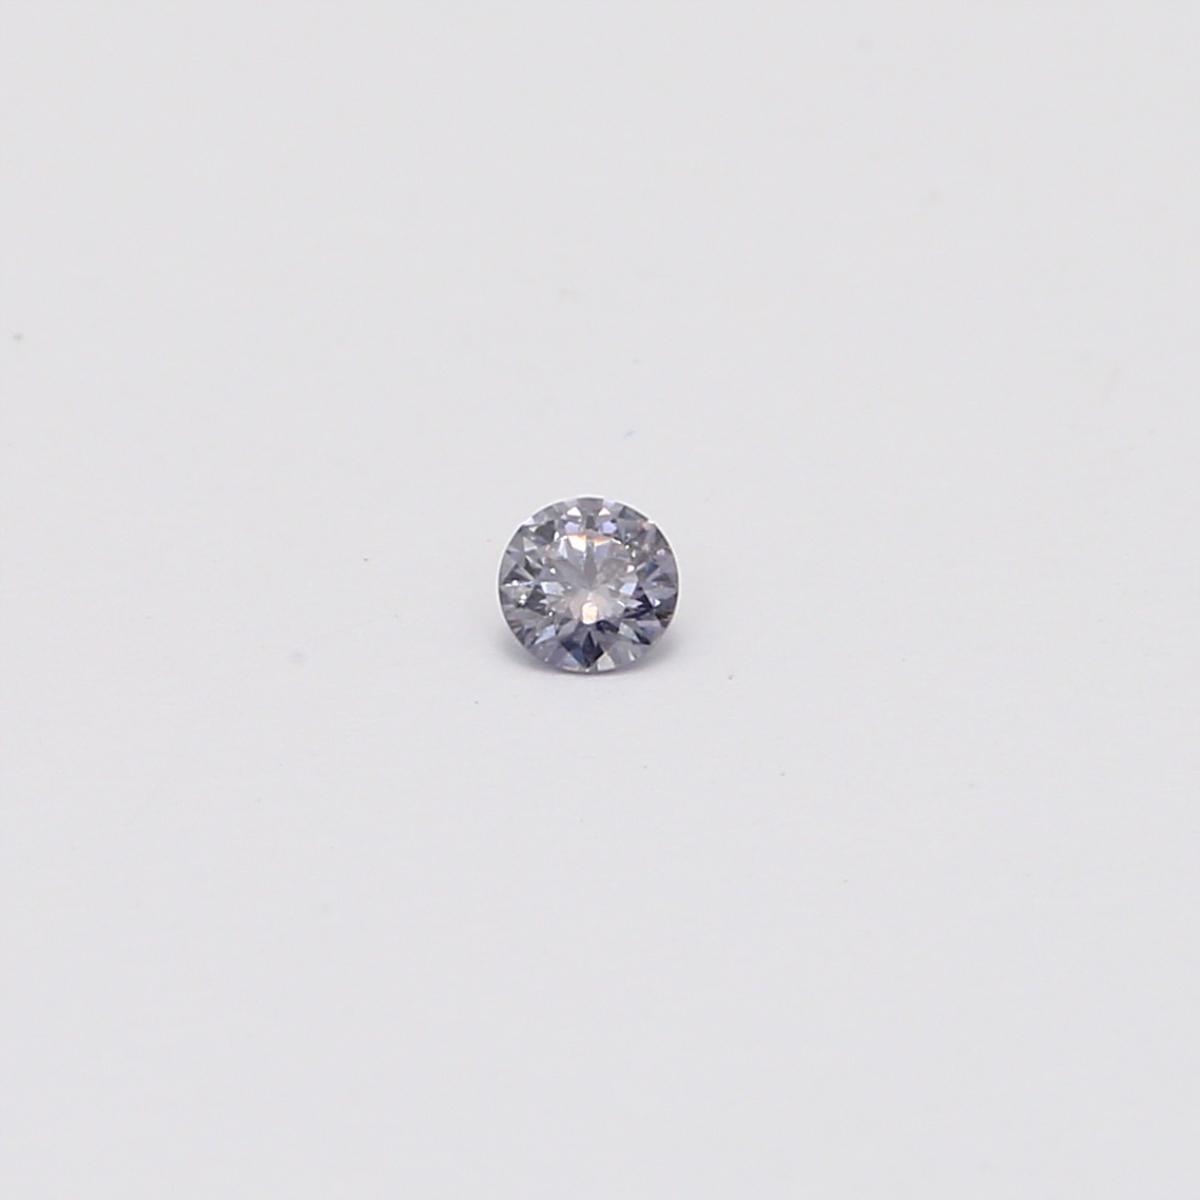 0.07 Carat Round Cut BL3 Argyle Blue Diamond